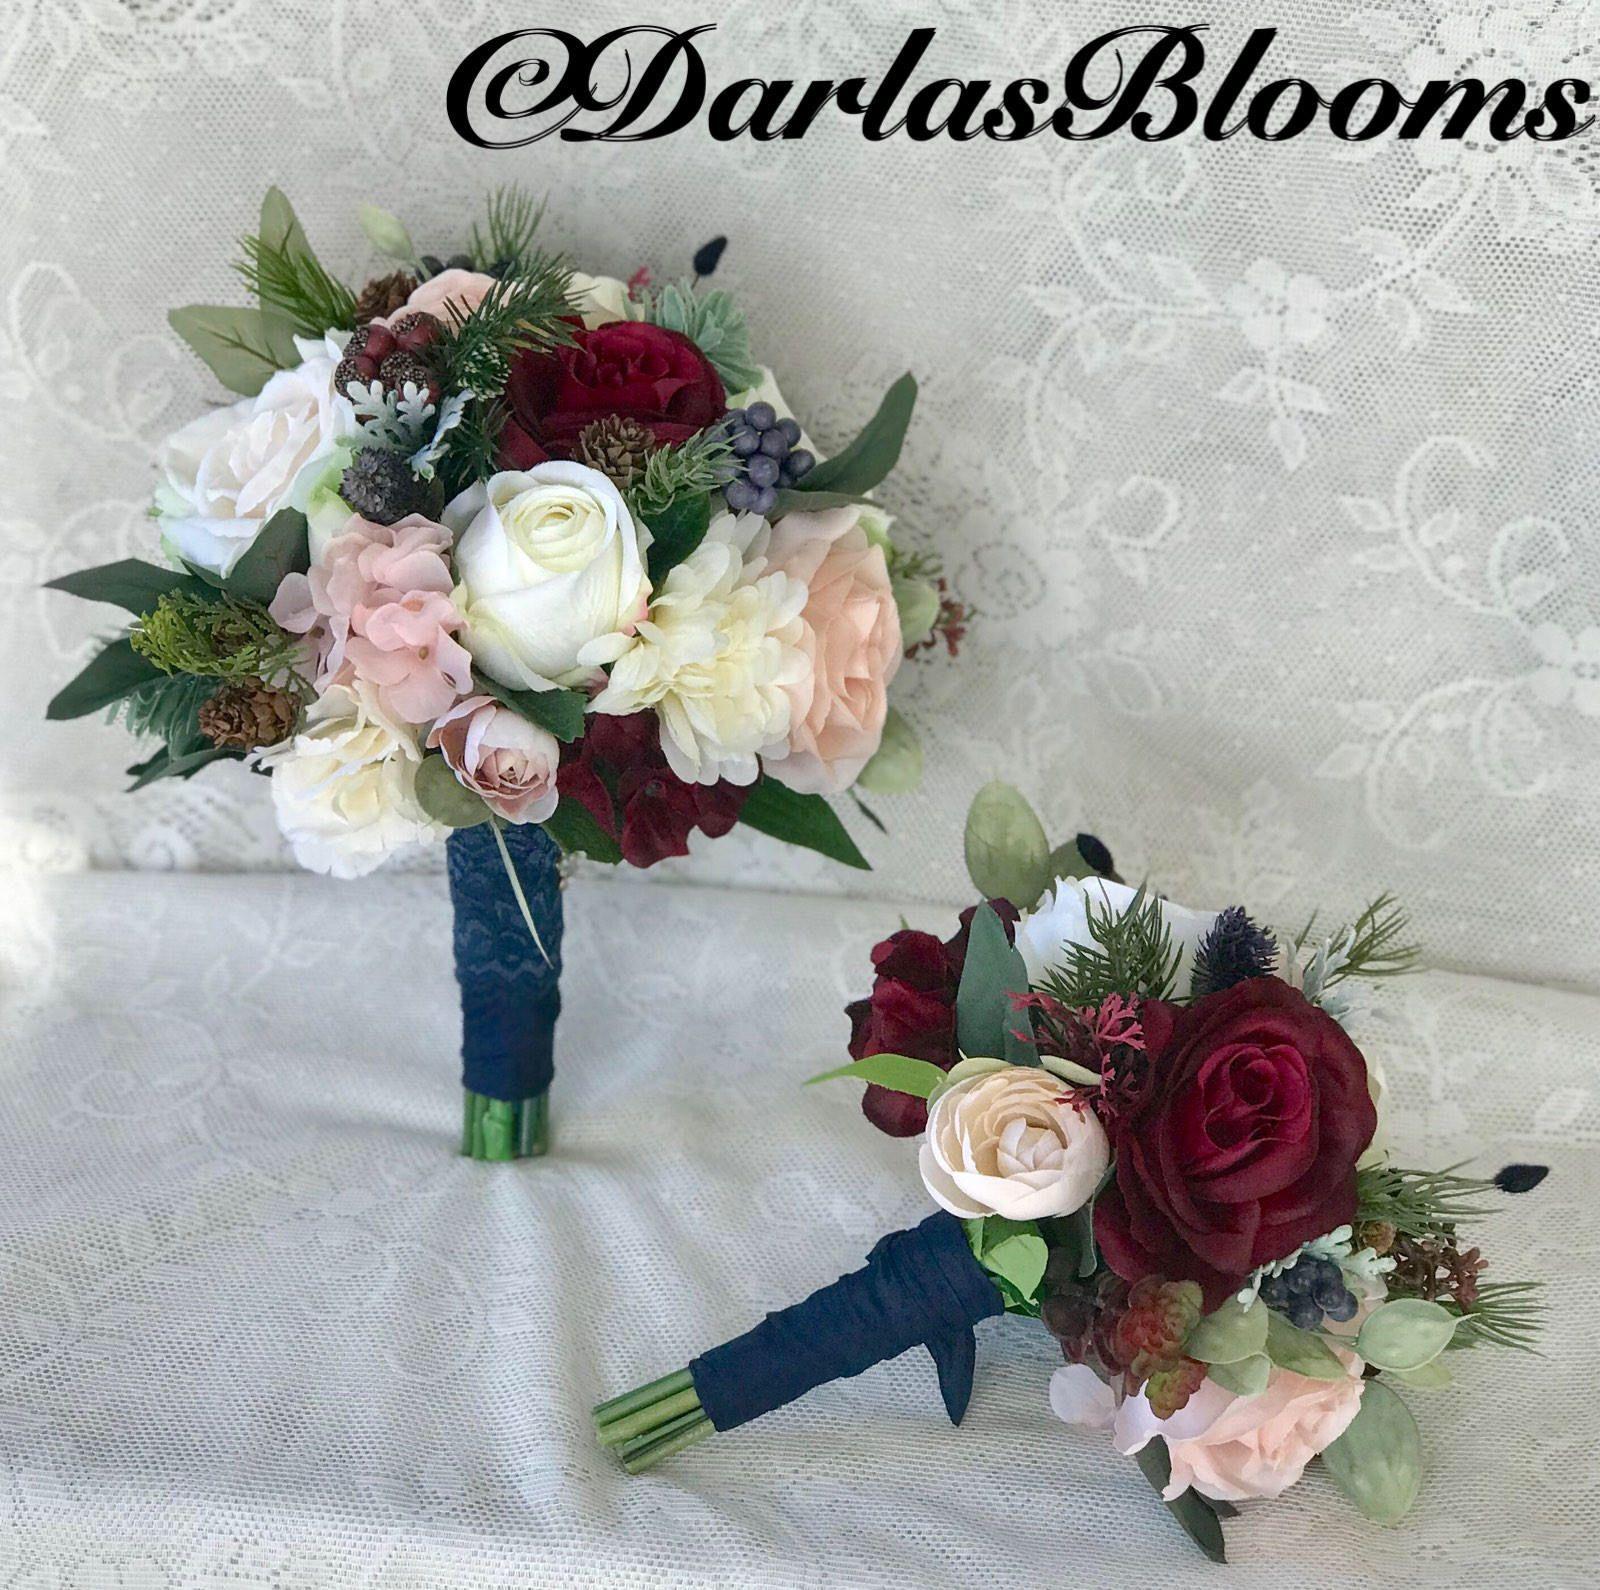 Wedding bouquet,Bridal bouquet,Burgundy & Navy bouquet